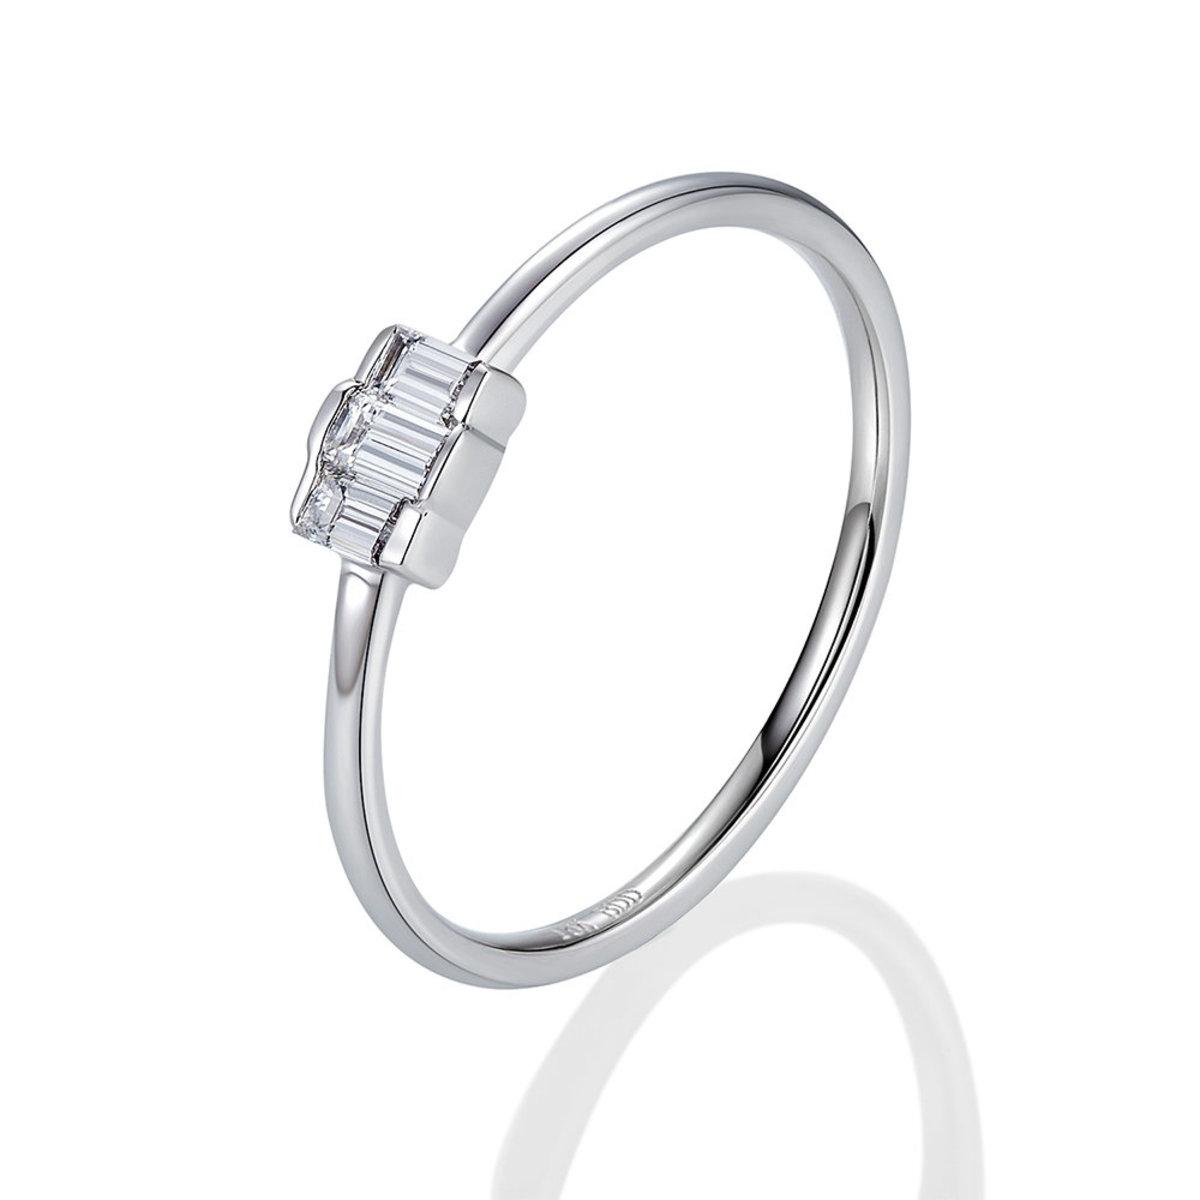 18K White Gold Diamond Ring (0.16 ct. tw.)